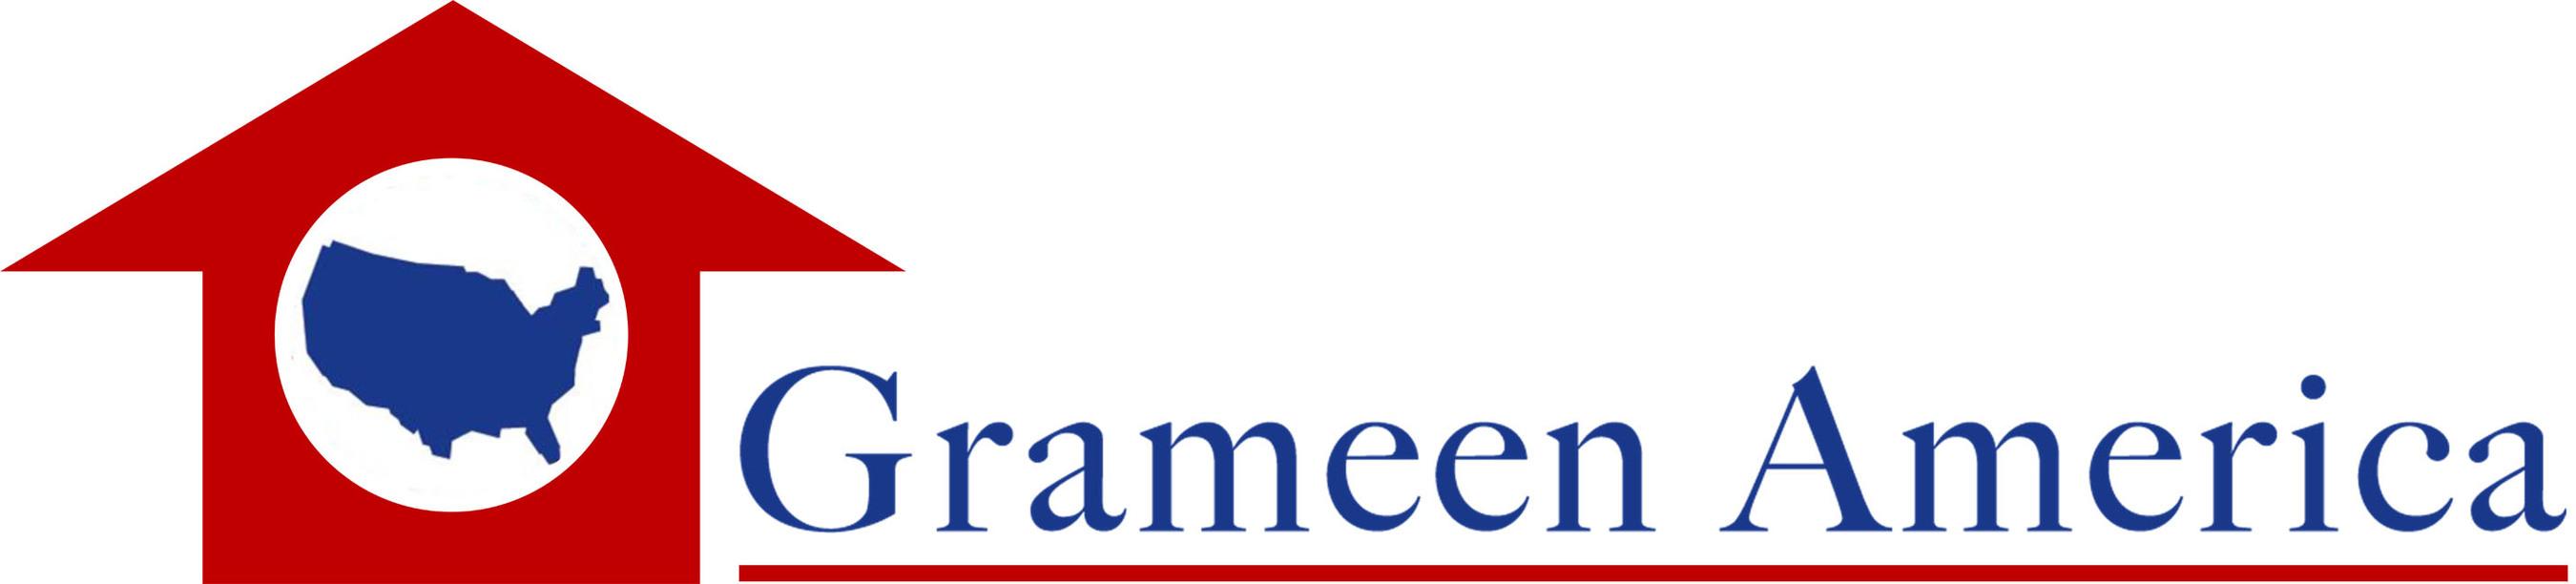 Grameen America Logo.